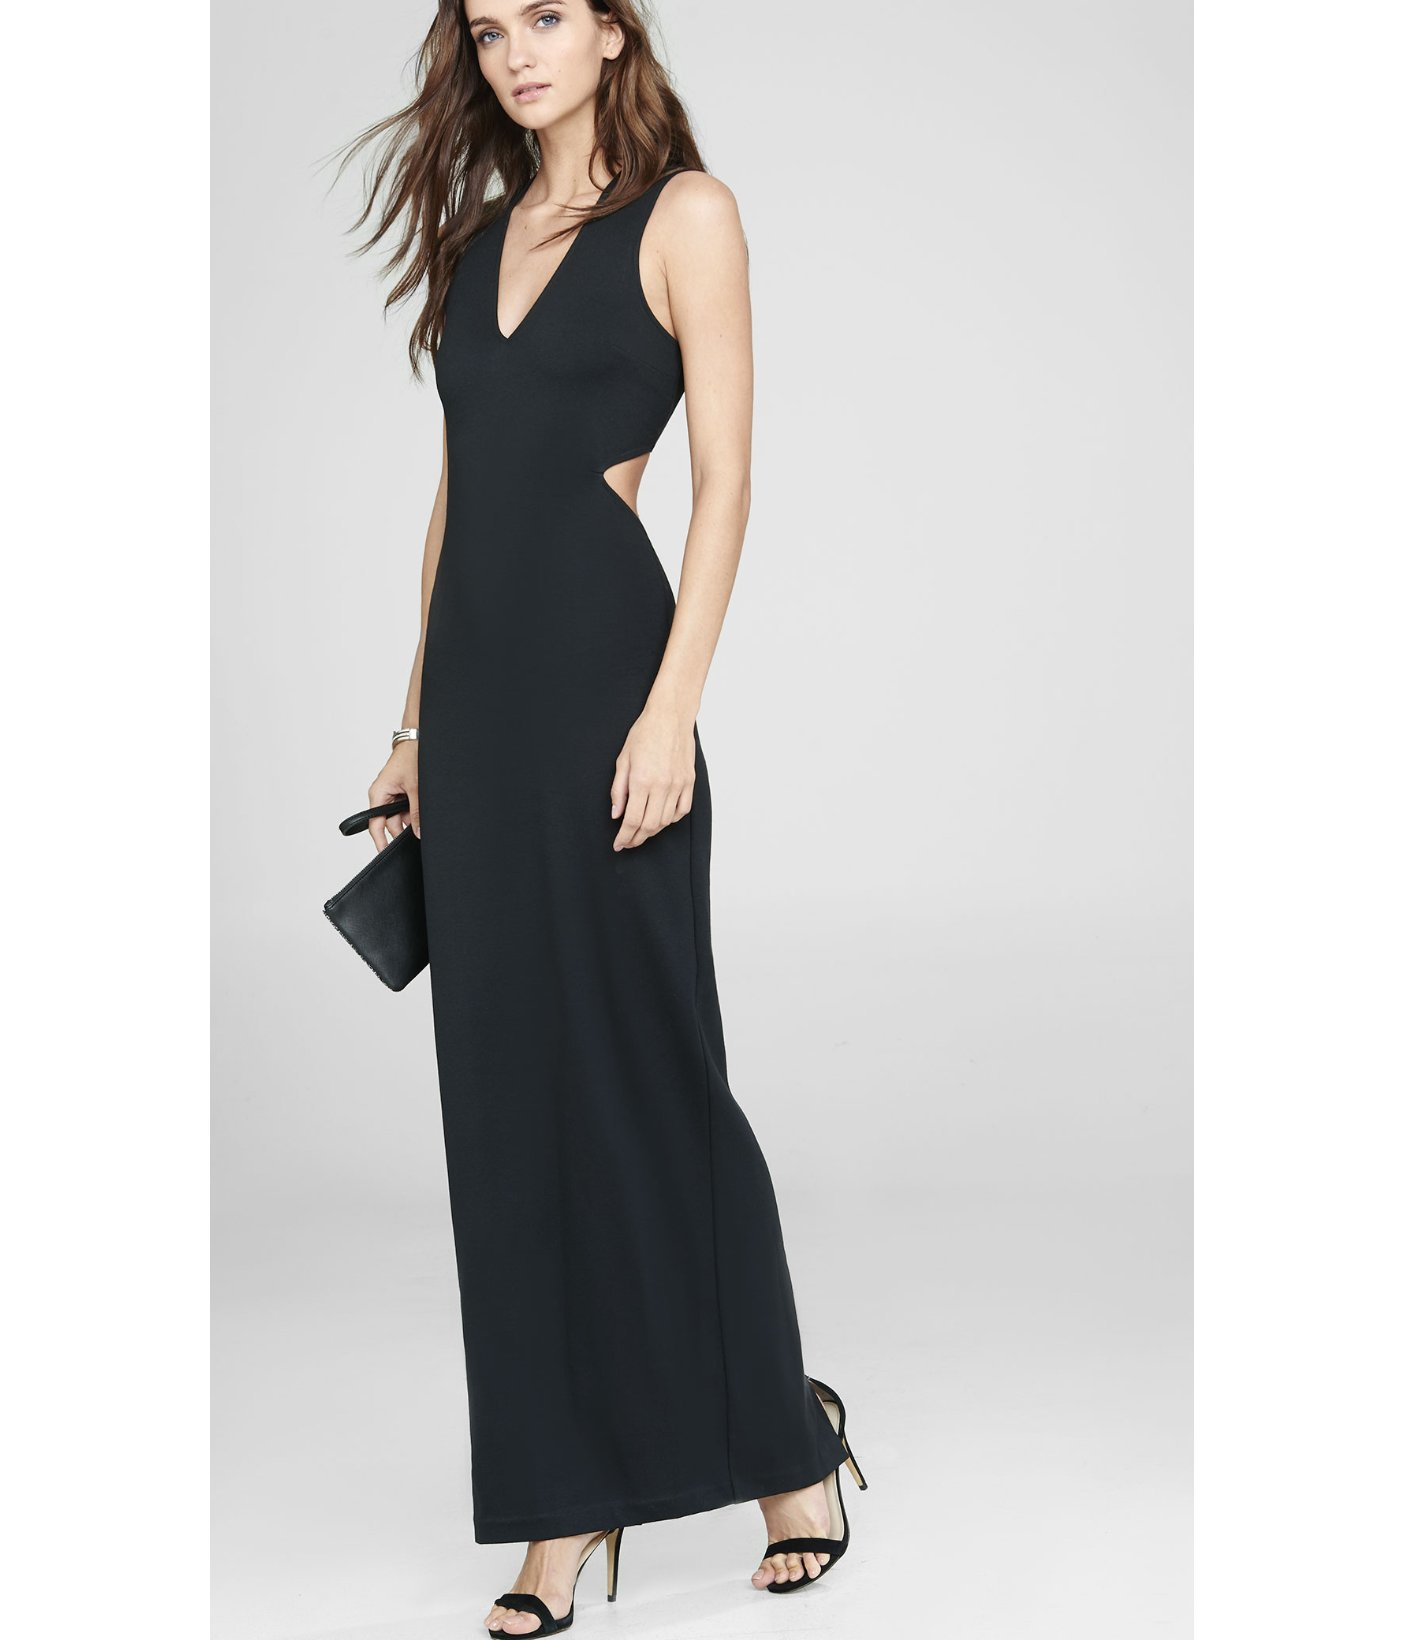 Lyst Express Black Deep V Neck Cut Out Sleeveless Maxi Dress In Black